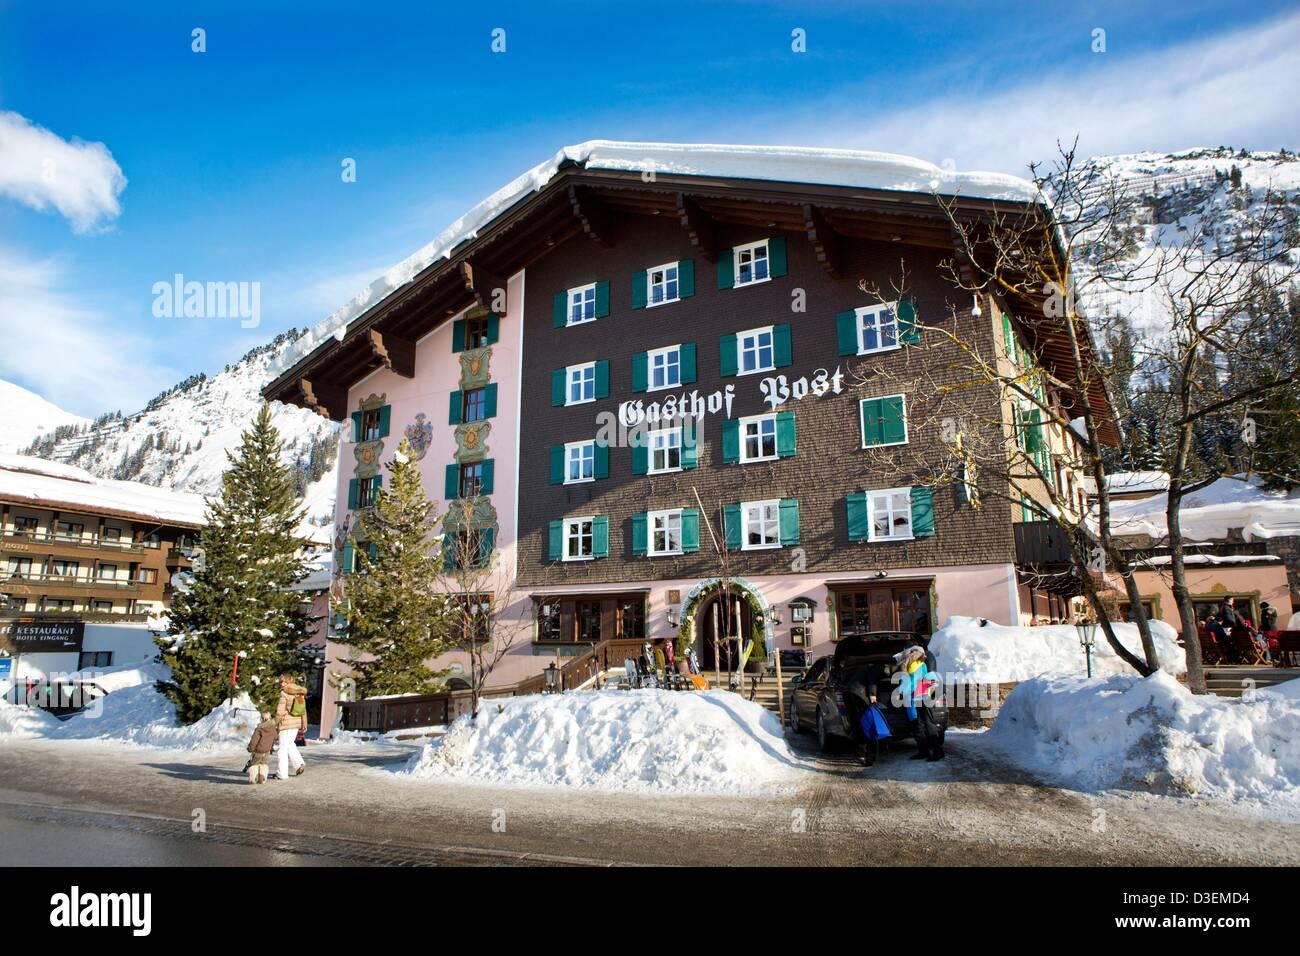 The Hotel Gasthof Post In Lech Am Arlberg Austria 17